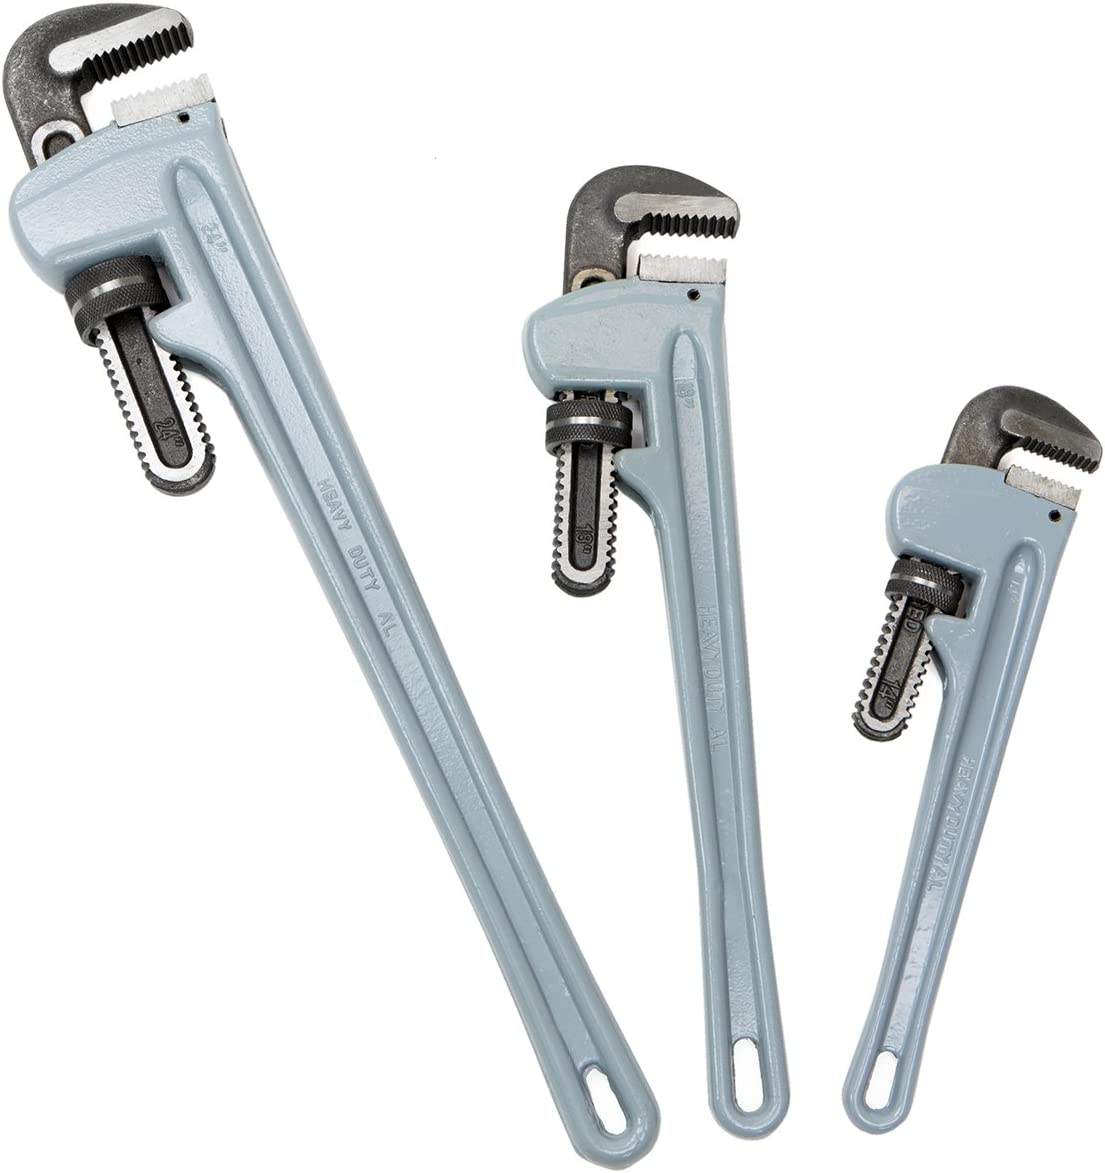 New sales Stark 3PCS Rapid rise Aluminium Pipe Wrench Adjustable Wr Plumbing Jaw